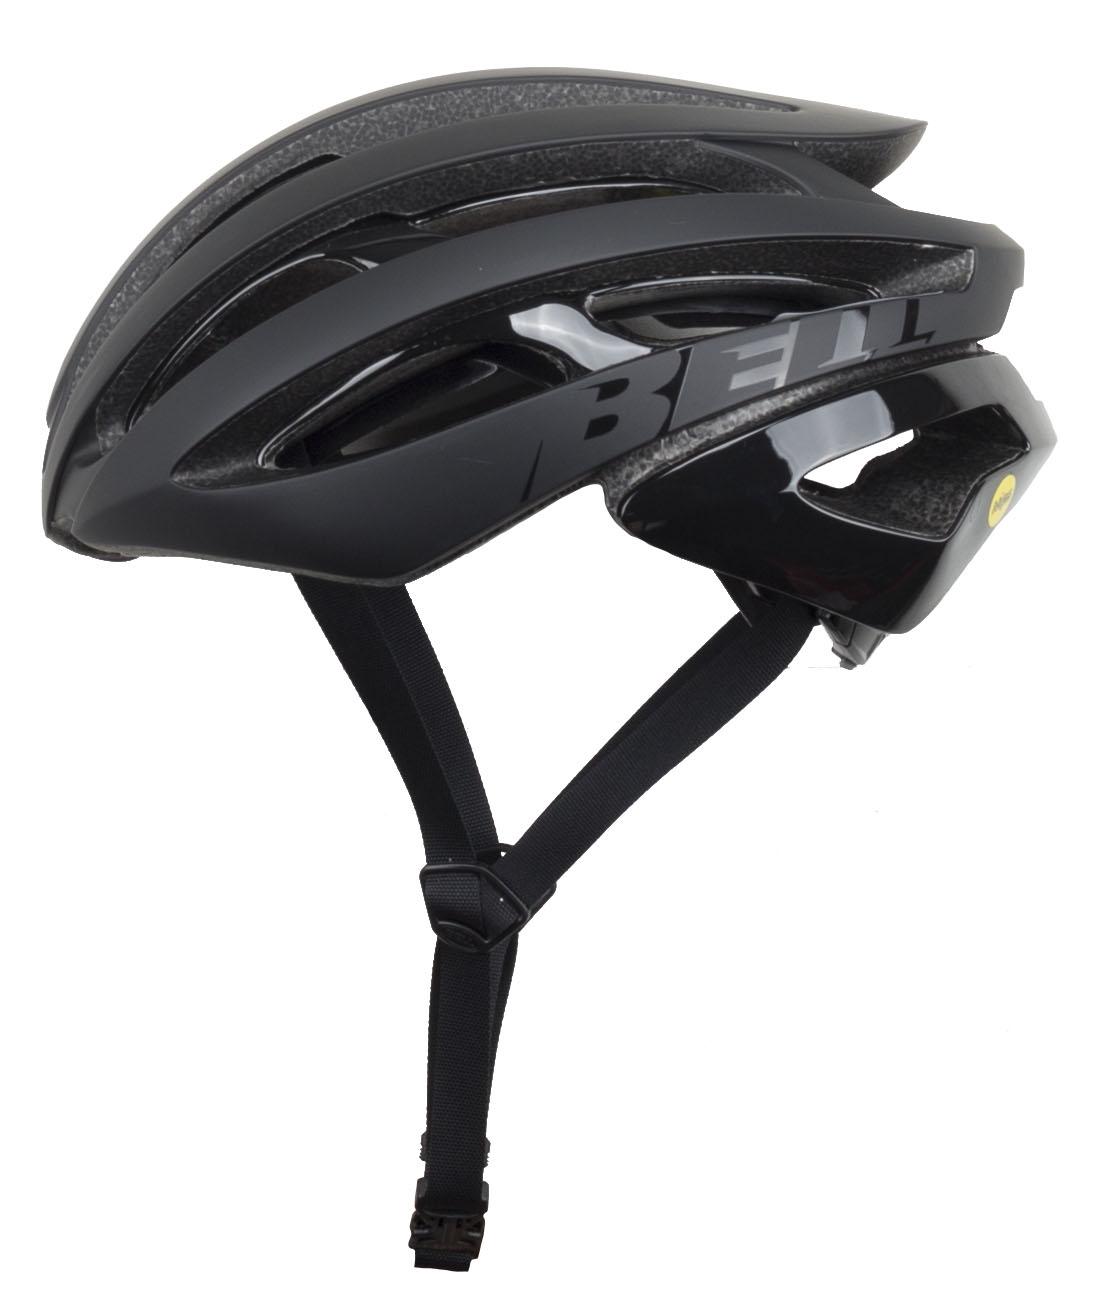 Bell | Z20 Mips Road Helmet Men's | Size Large in Black